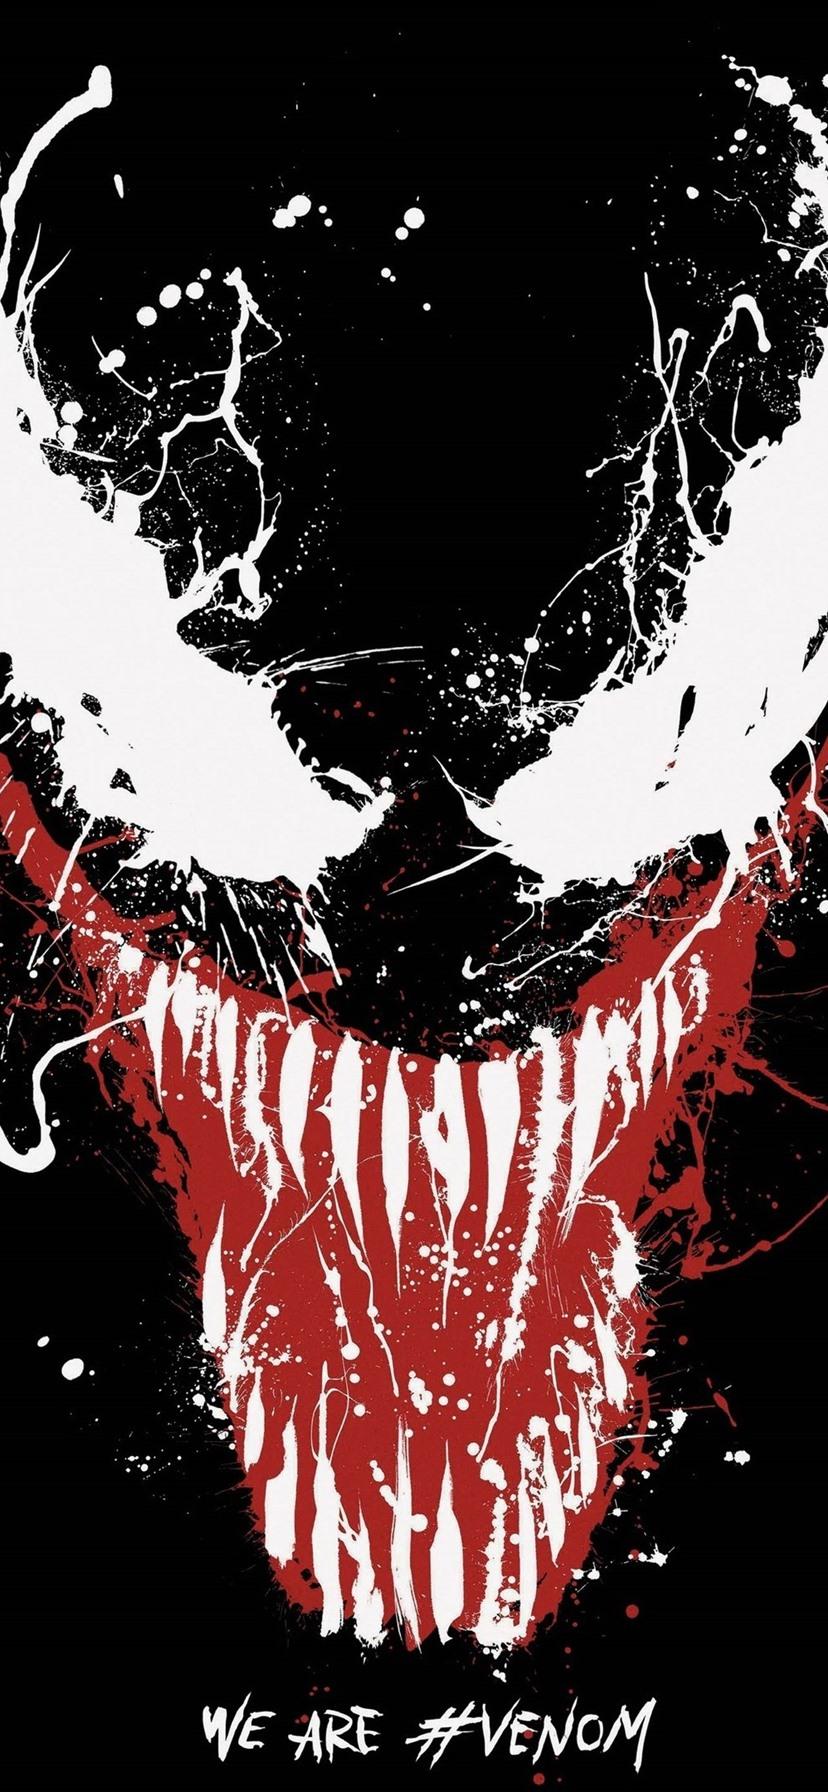 Wallpaper Venom Marvel Superhero Paint Splash Eyes Teeth Black